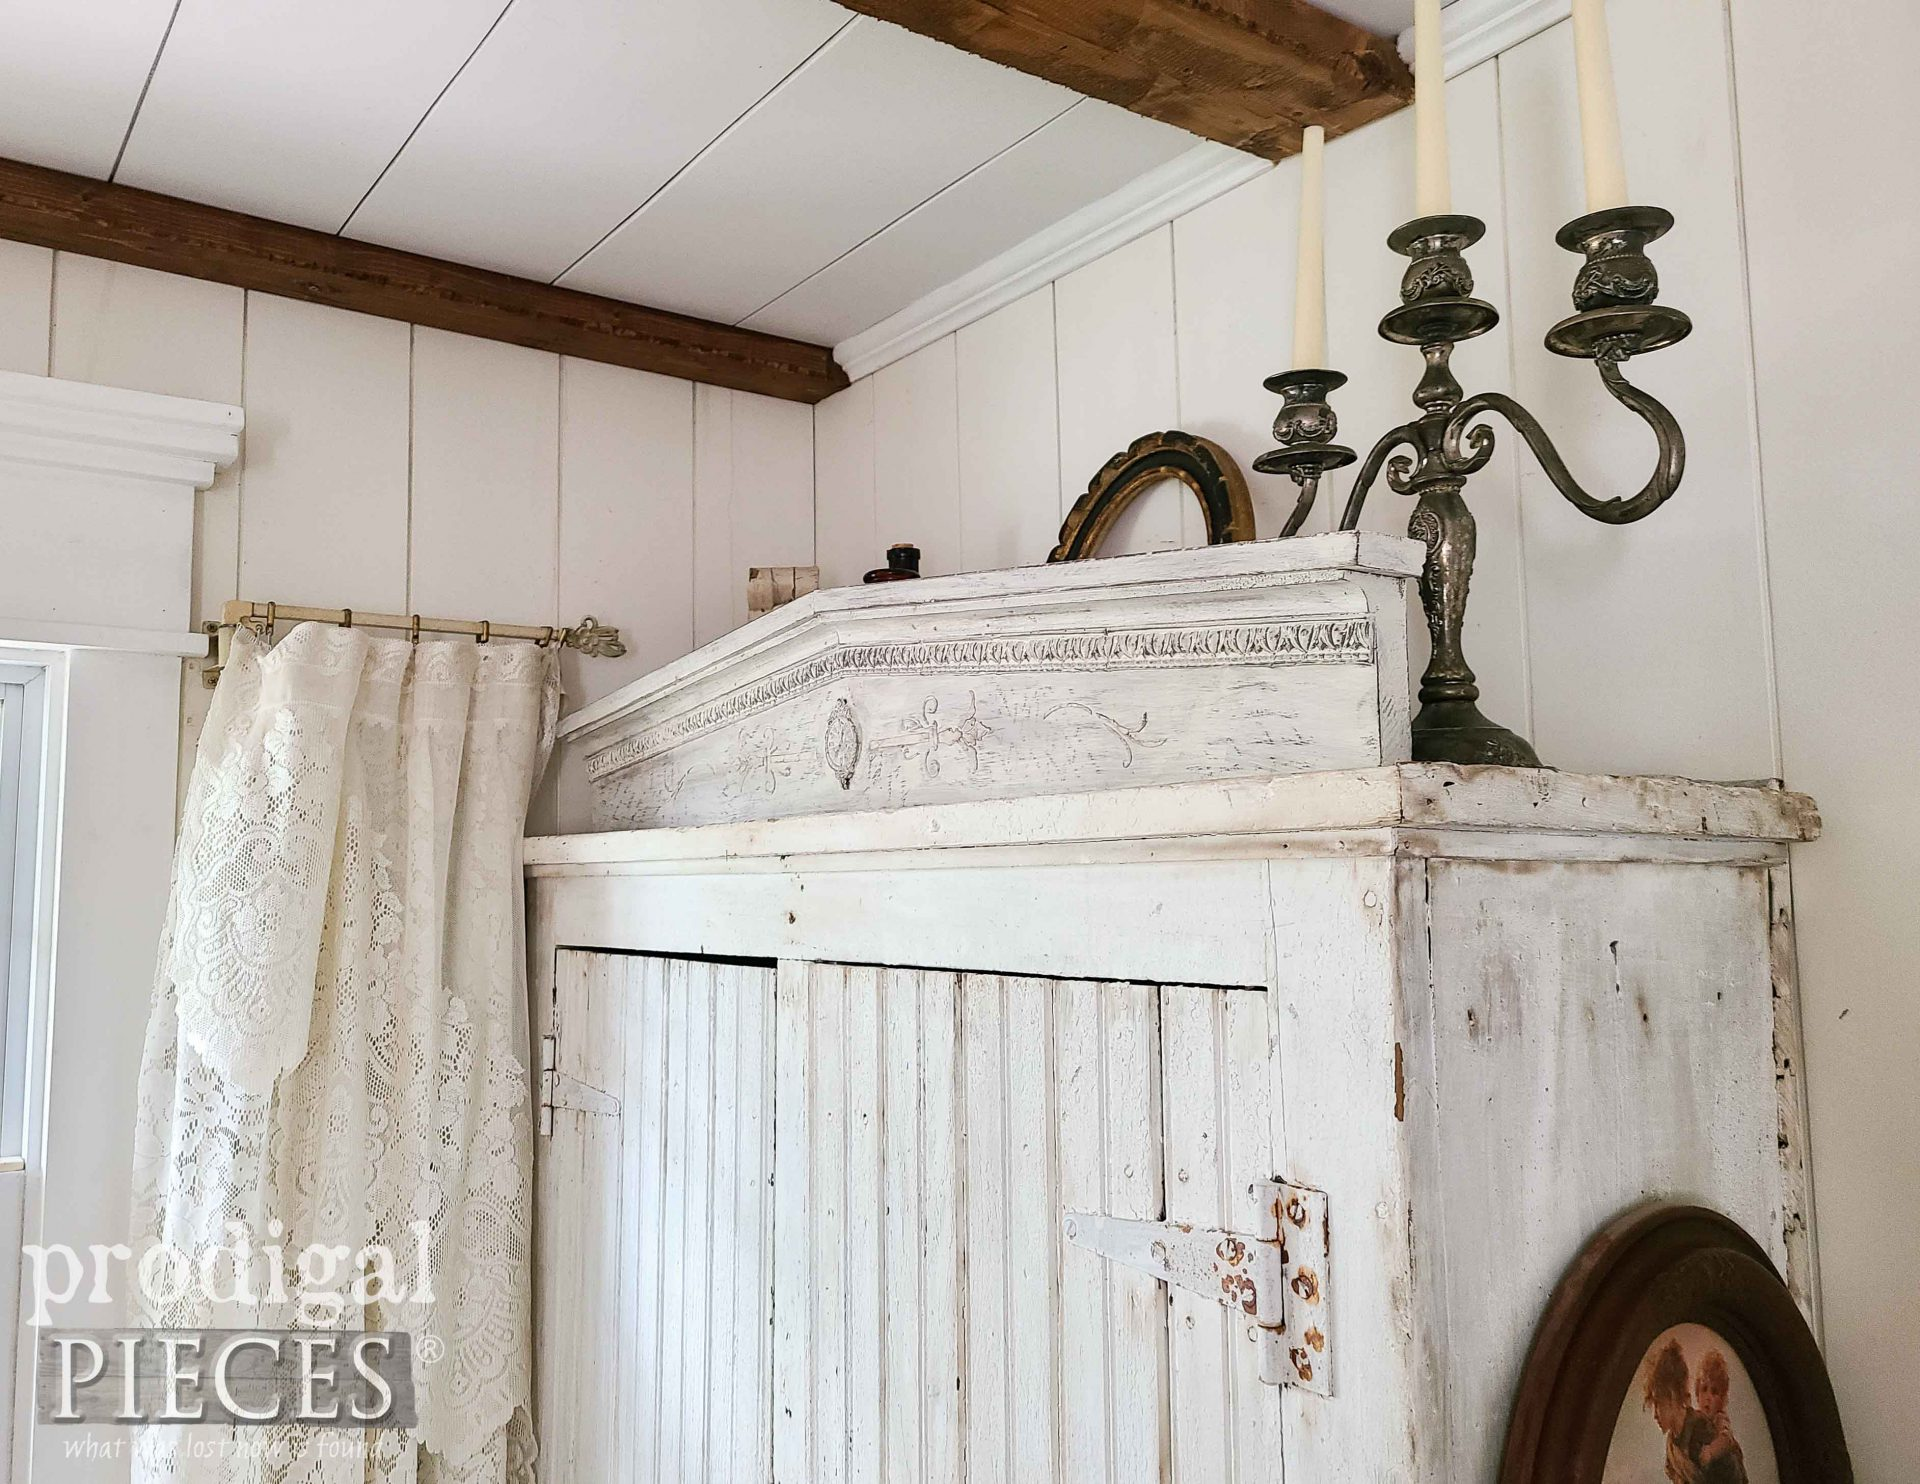 Chippy White Farmhouse Pediment with DIY Tutorial by Larissa of Prodigal Pieces | prodigalpieces.com #prodigalpieces #diy #home #farmhouse